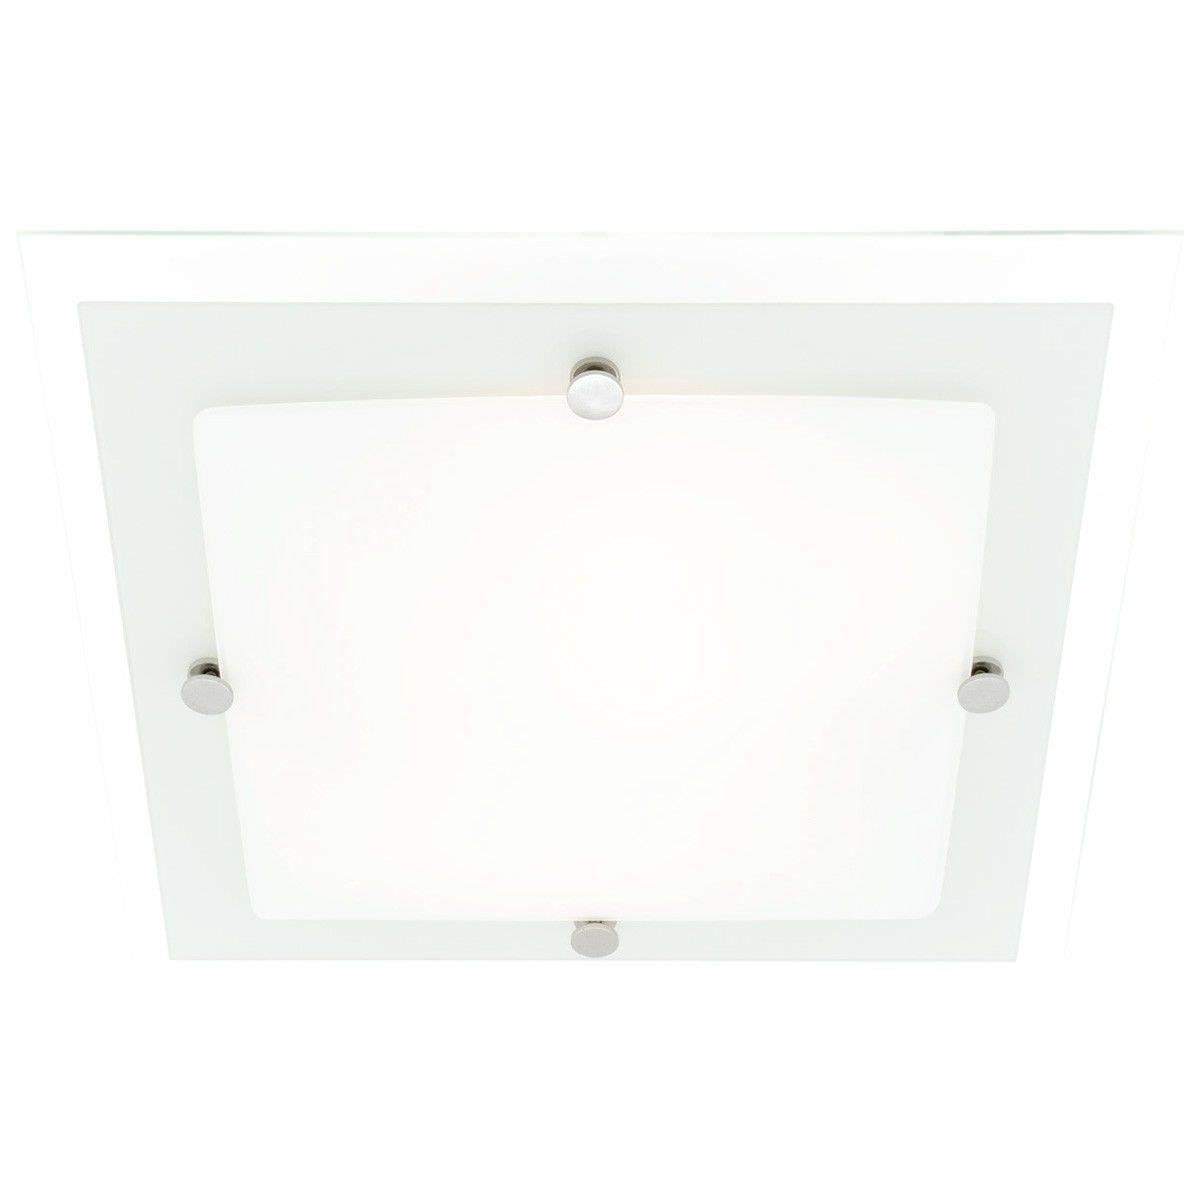 Cougar Essex 36cm 2 Light Oyster Square Ceiling Light